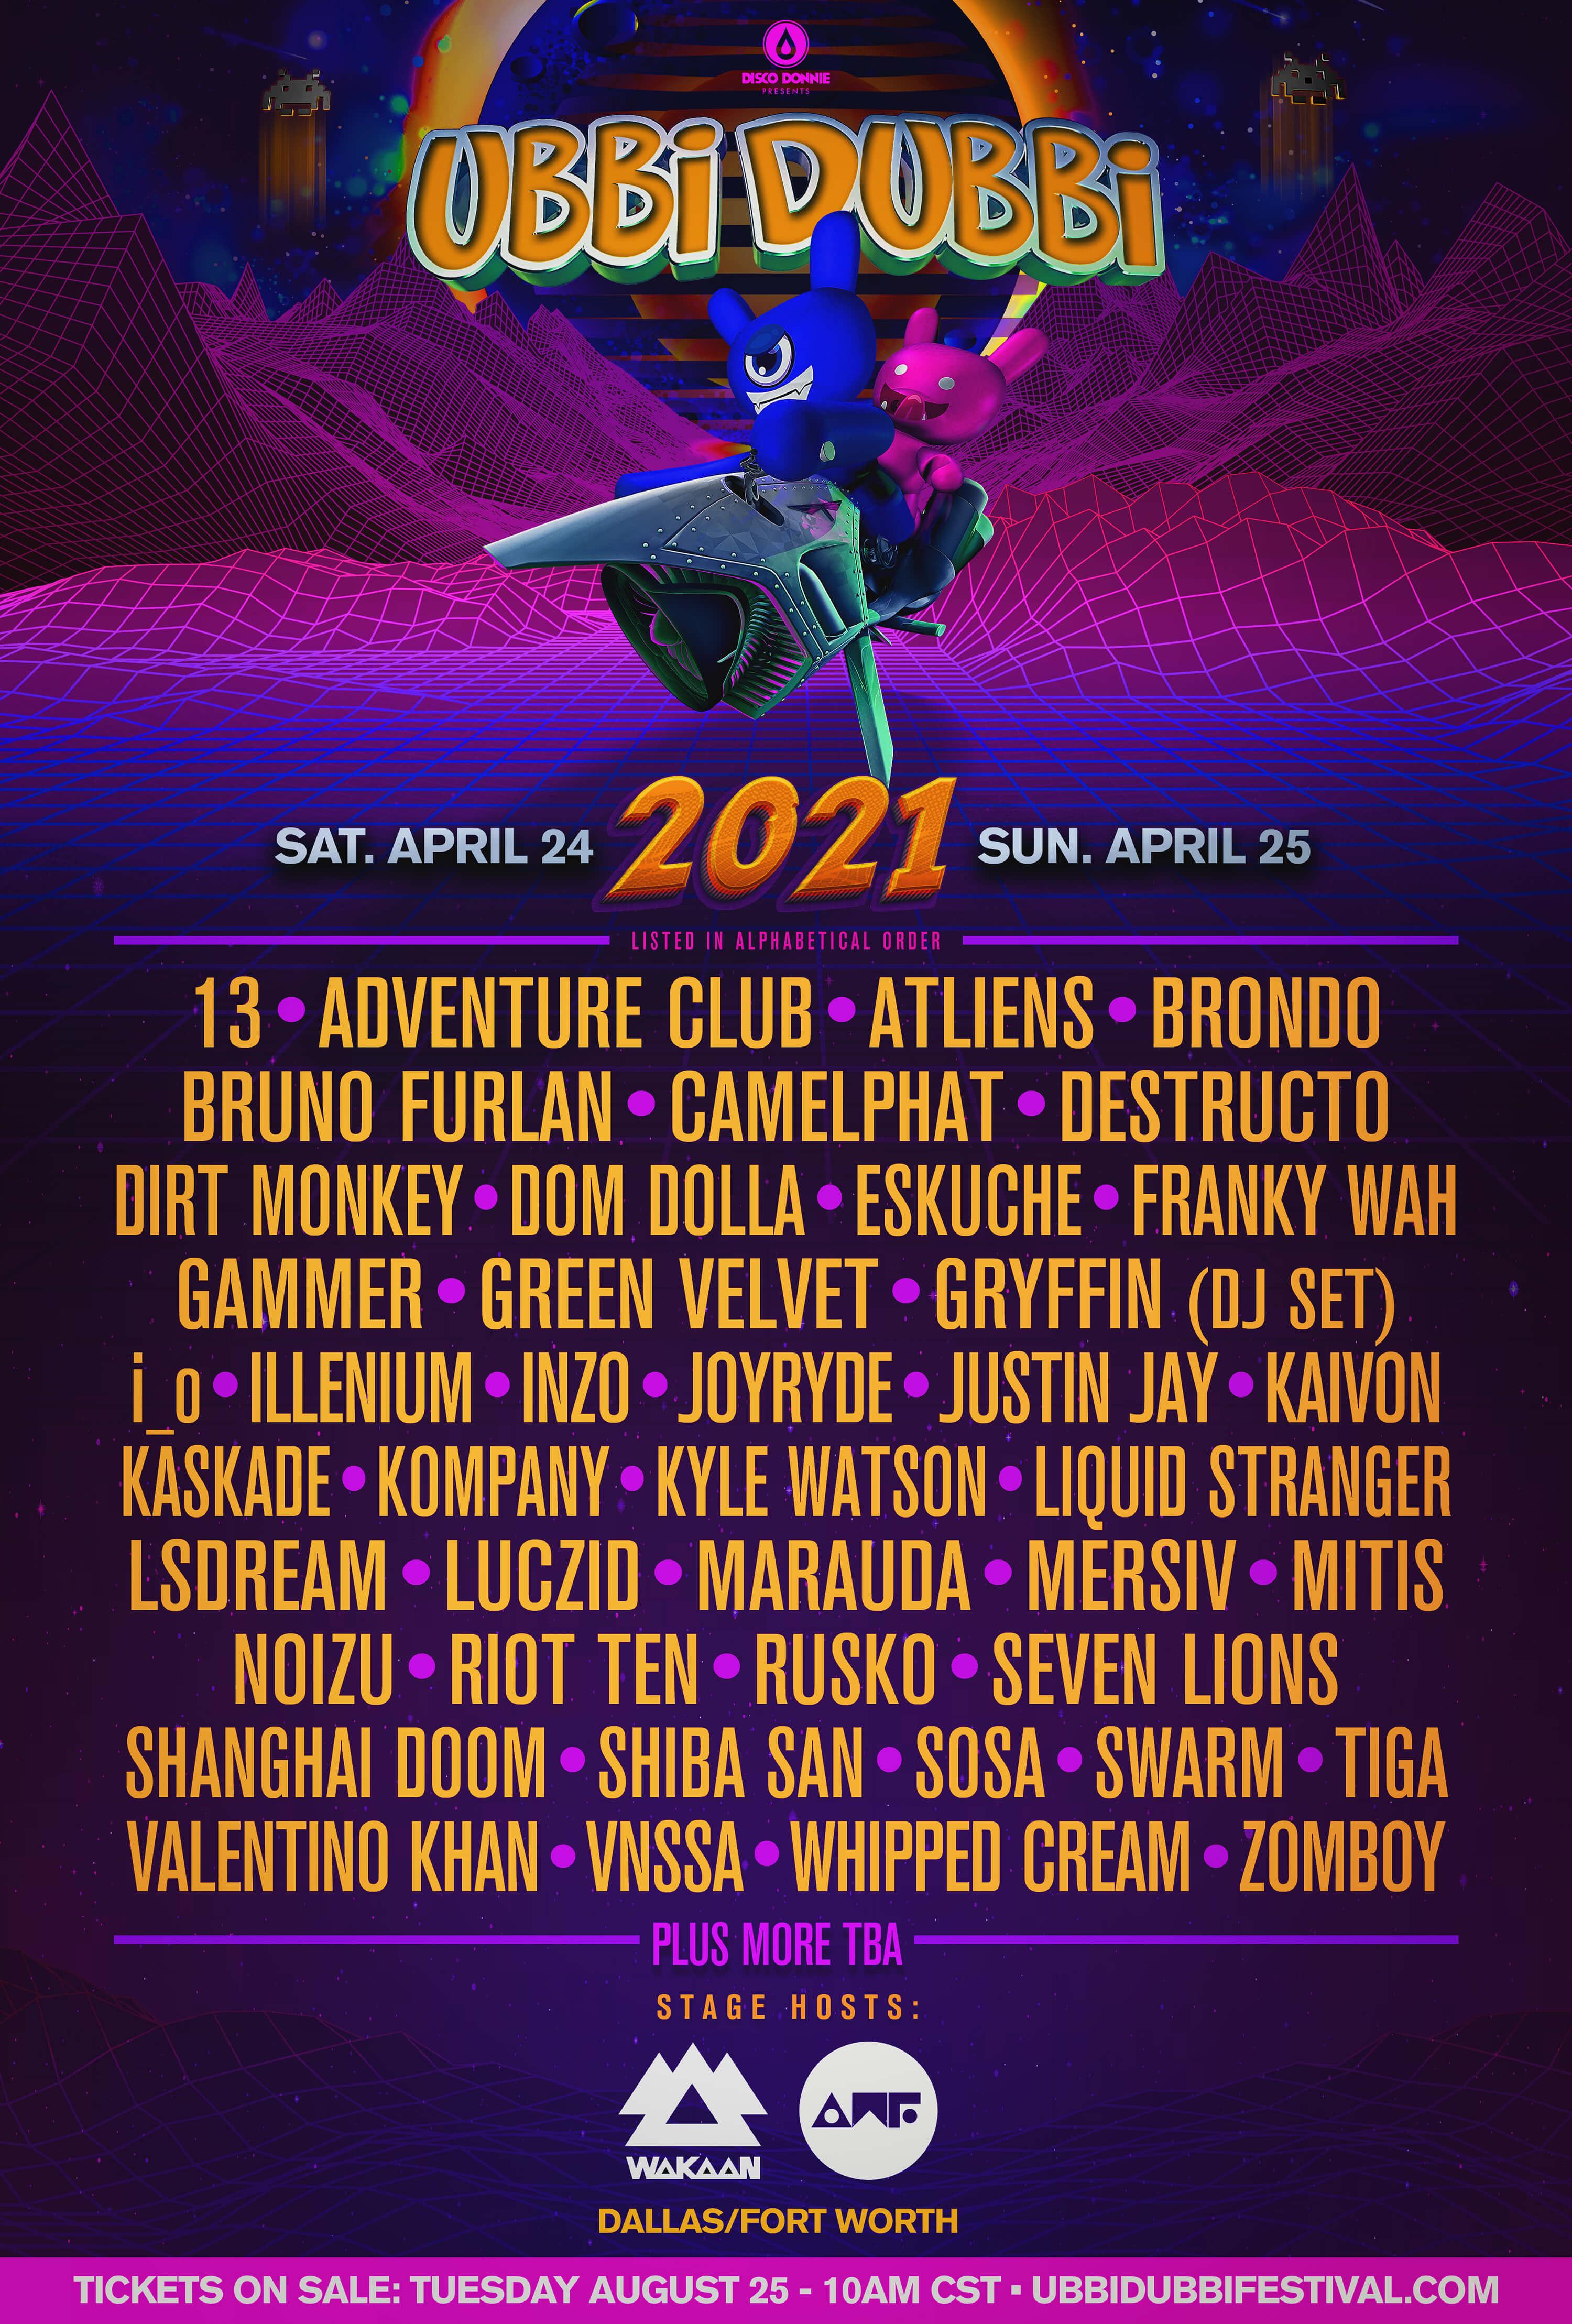 ubbi dubbi 2021 phase one lineup